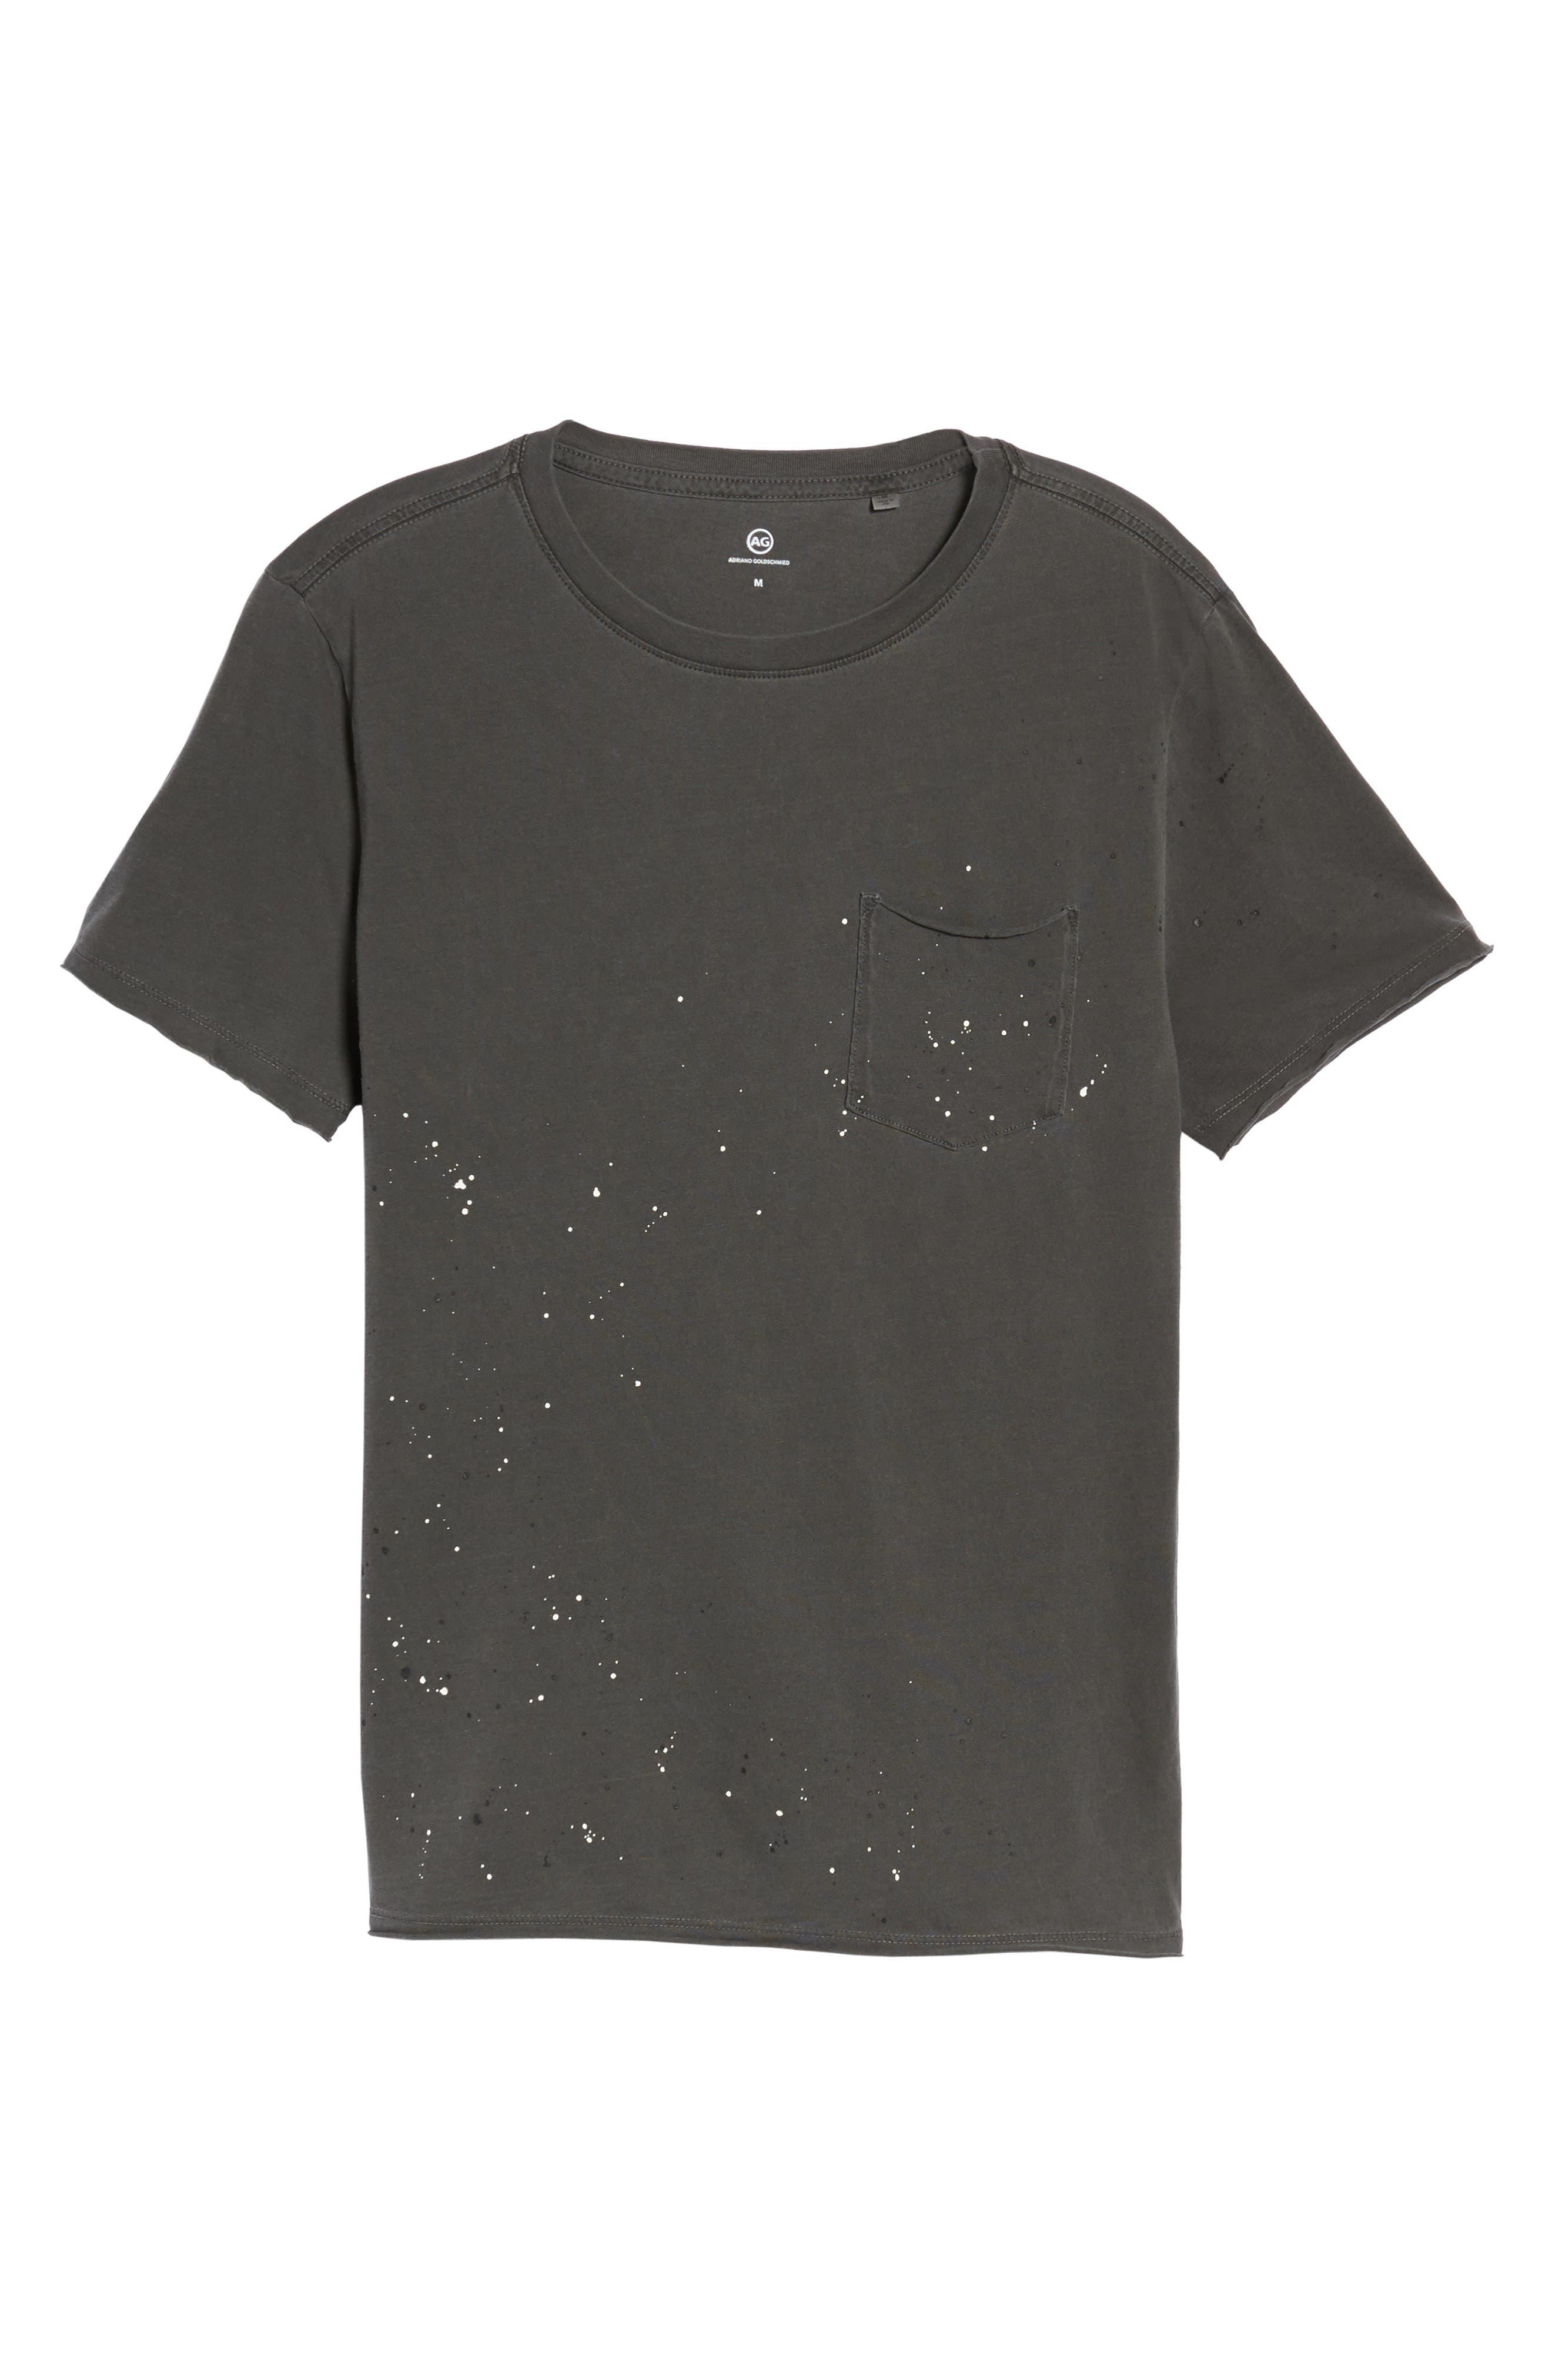 Anders Slim Fit Pocket T-Shirt,                             Alternate thumbnail 6, color,                             Multi Splatter Pigment Black